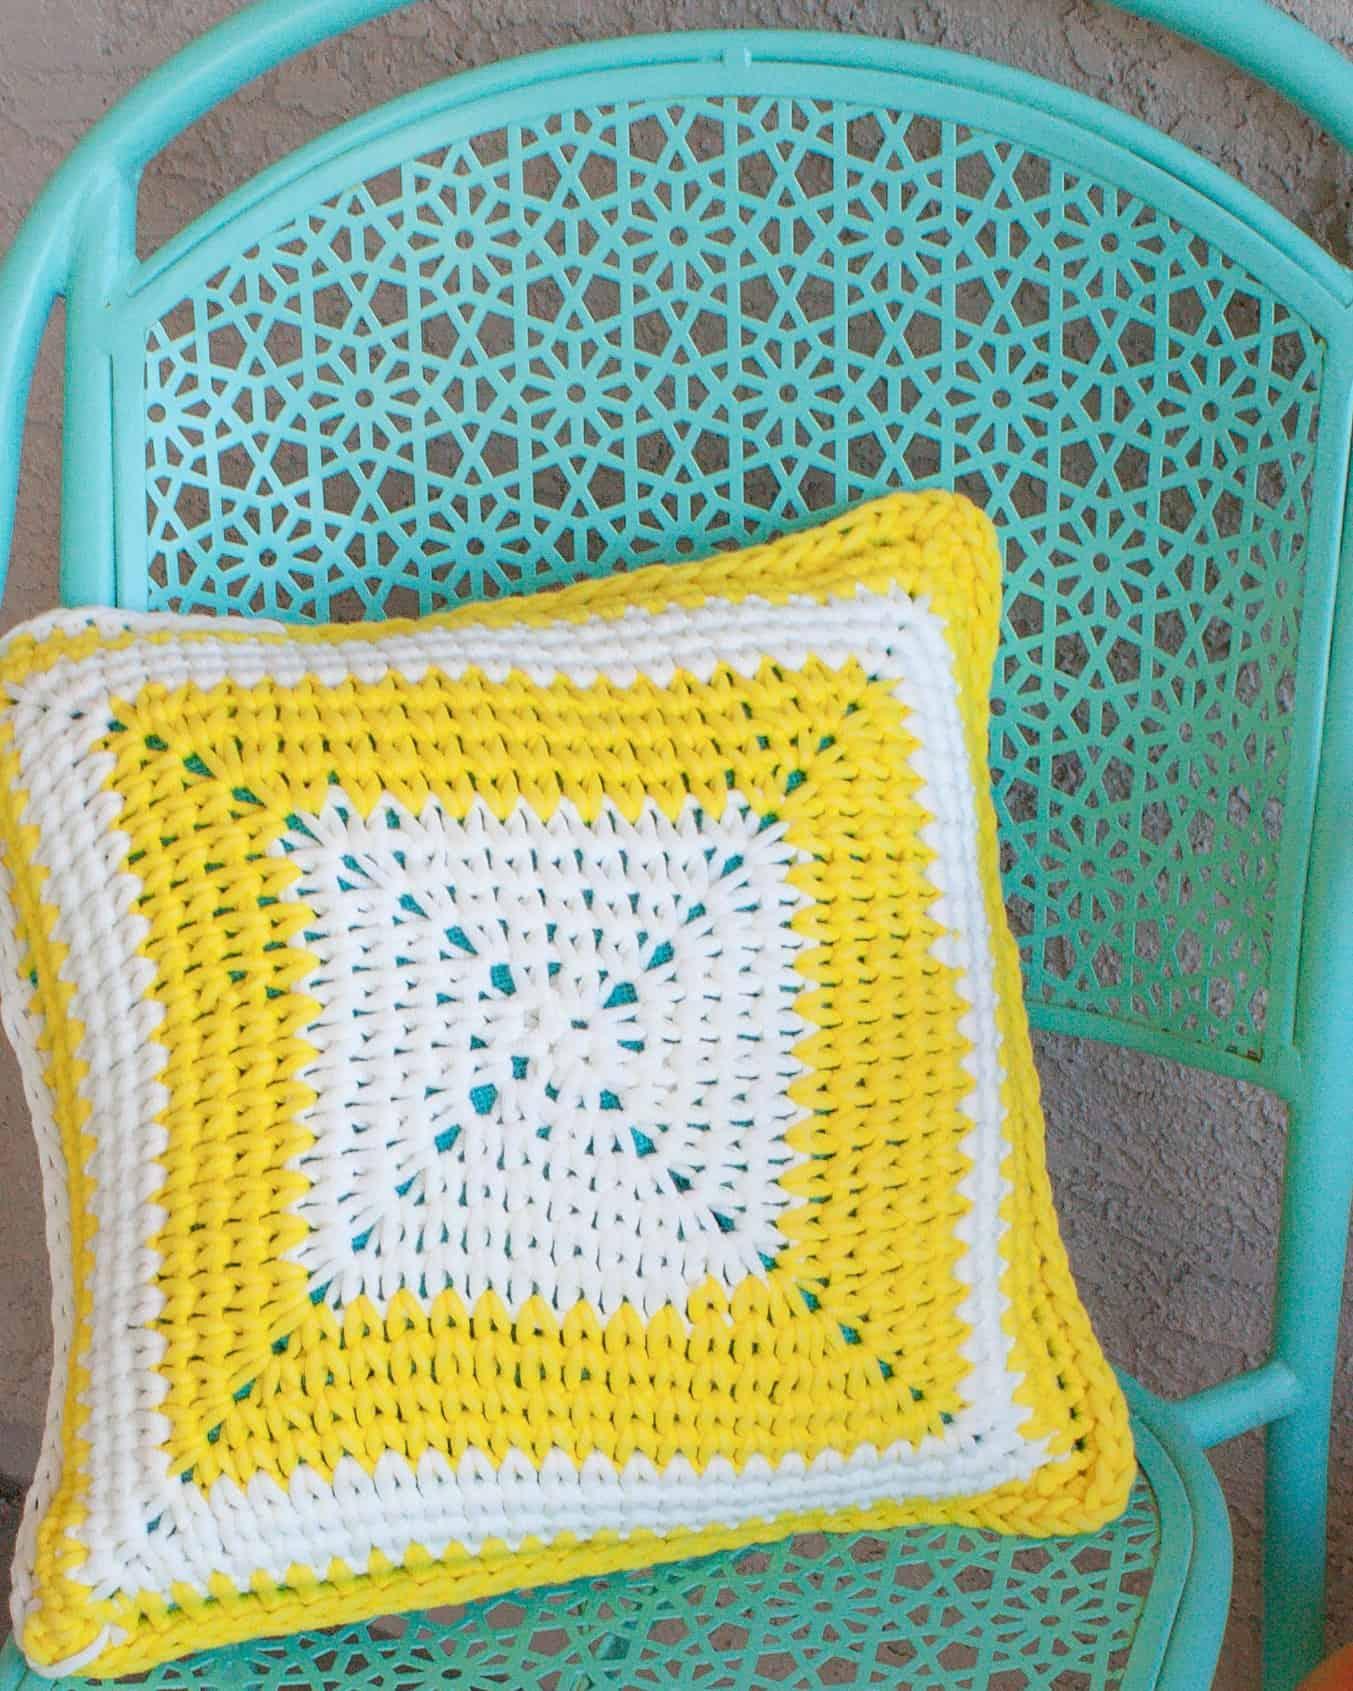 Sun Shine Patio Pillow: Free Crochet Pattern - Winding Road Crochet